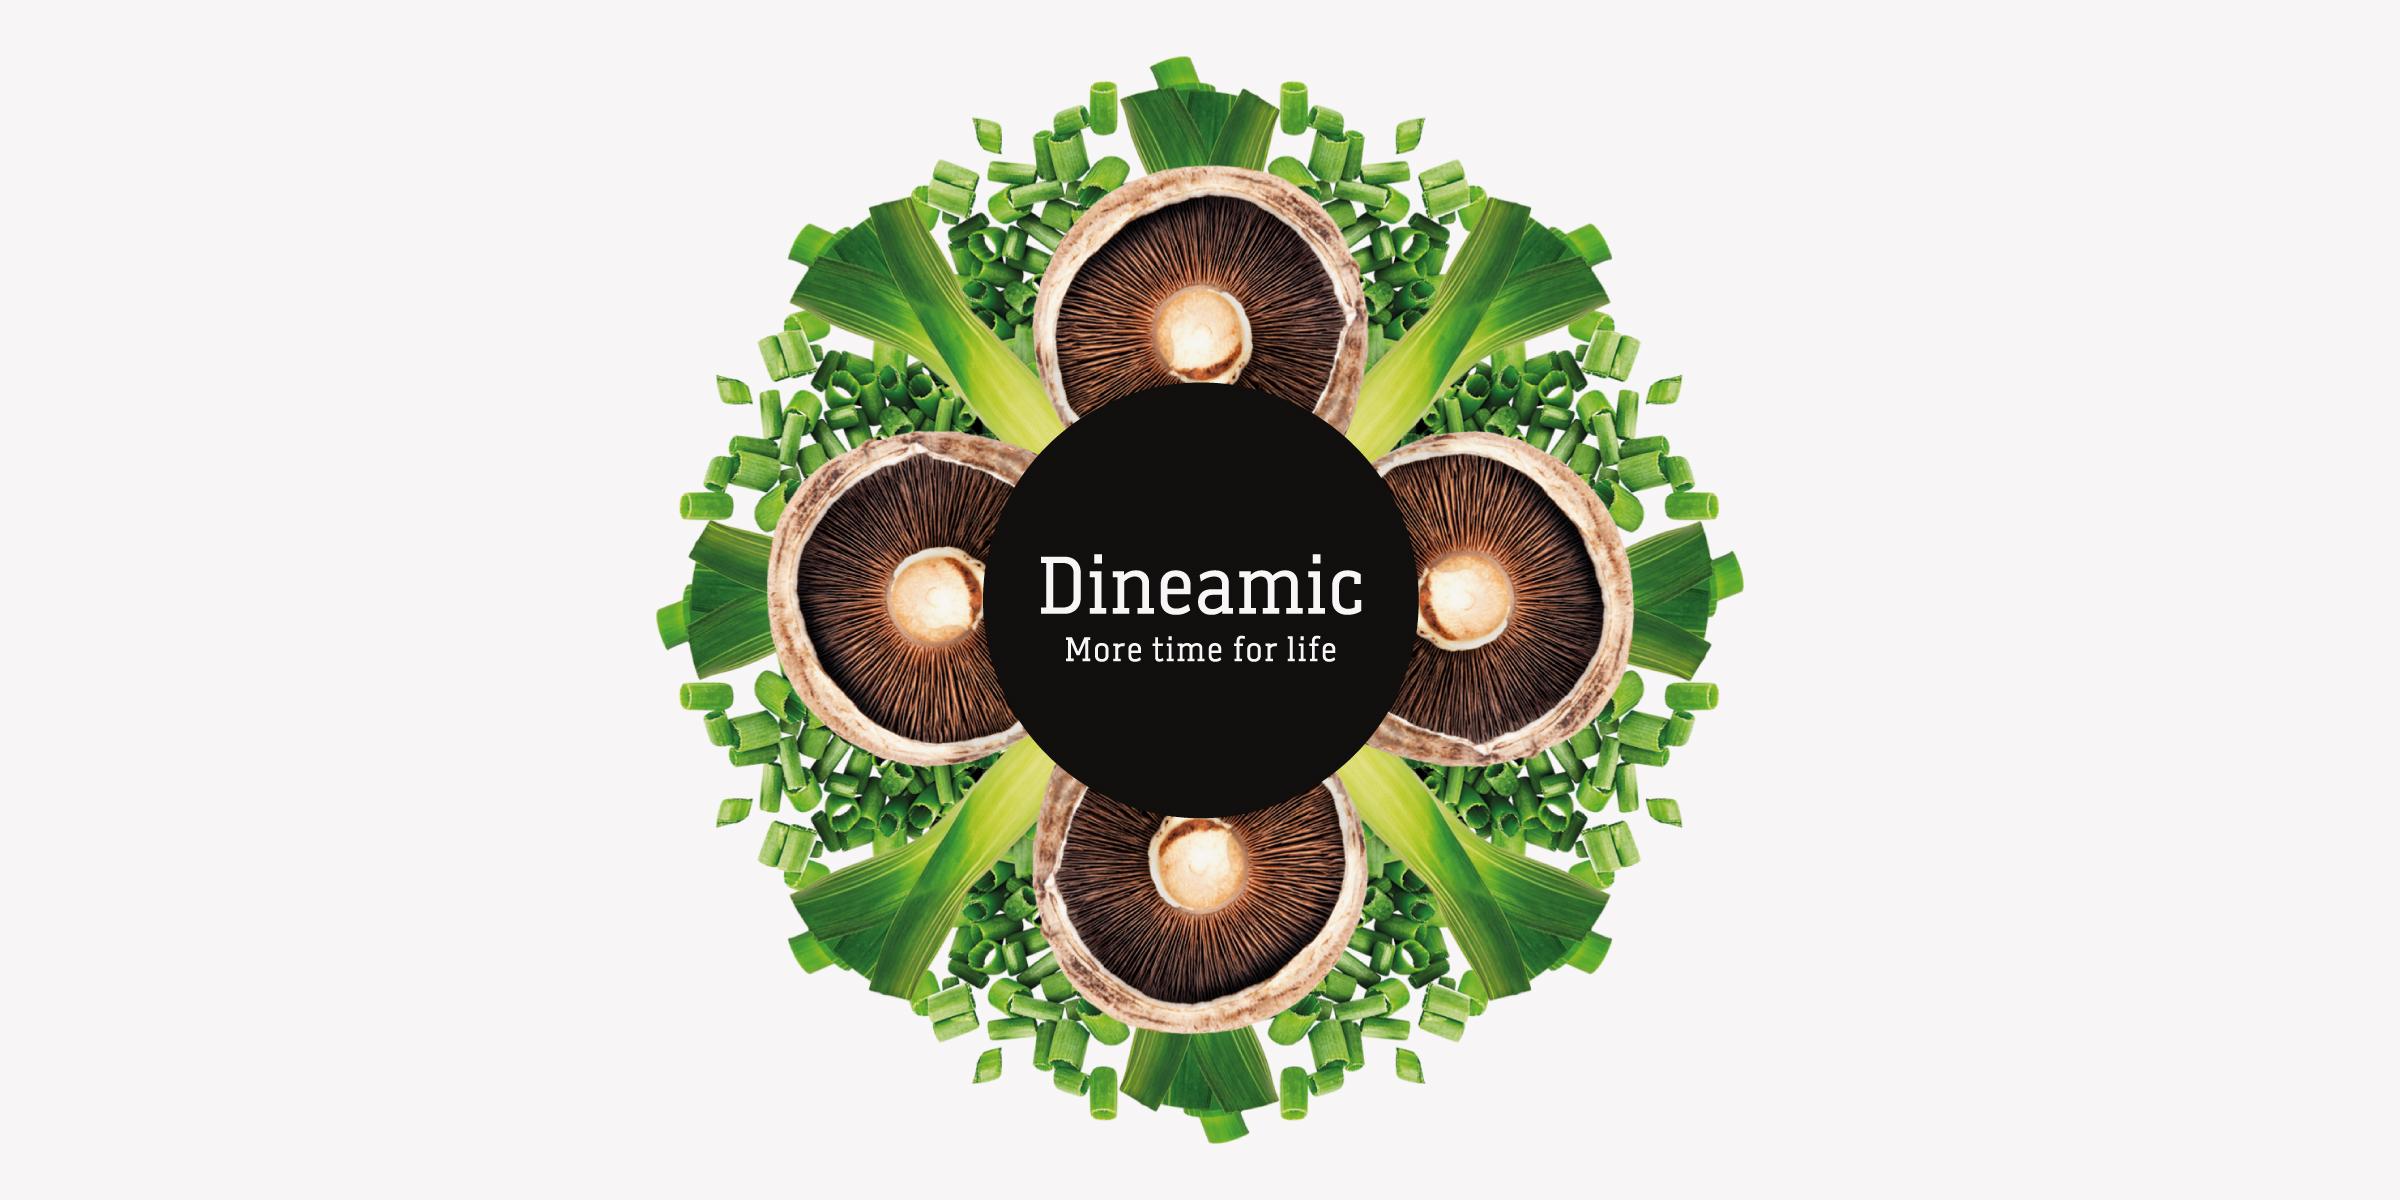 Davidson Branding FMCG Dineamic Packaging Visual Language Kaleidoscope Spring Onion Mushroom Banner